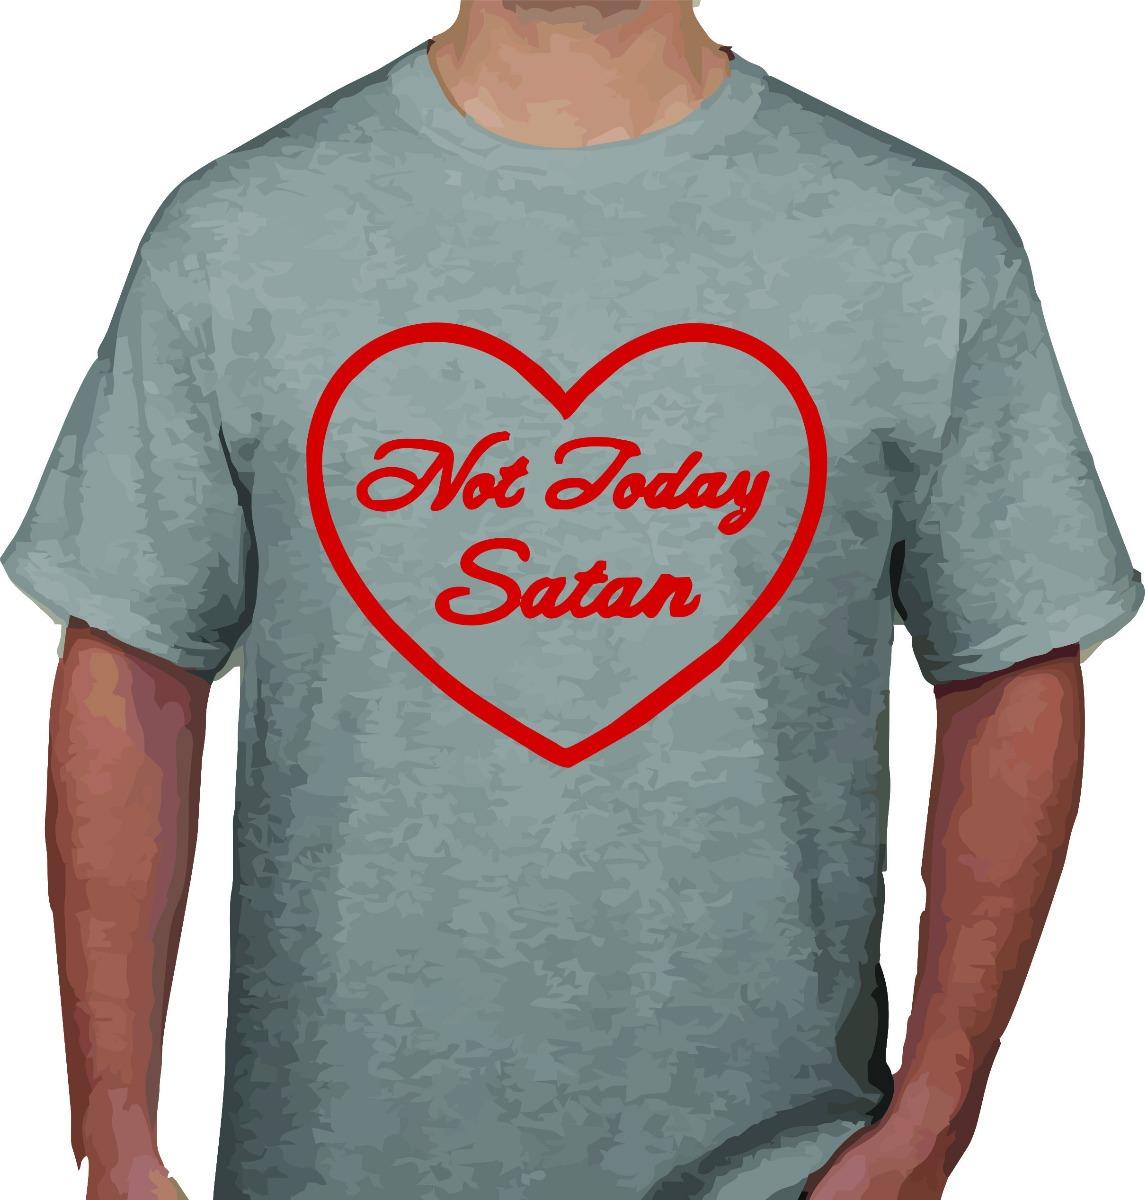 a8cd33ea camiseta unissex not today satan moda alternativa sabrina. Carregando zoom.